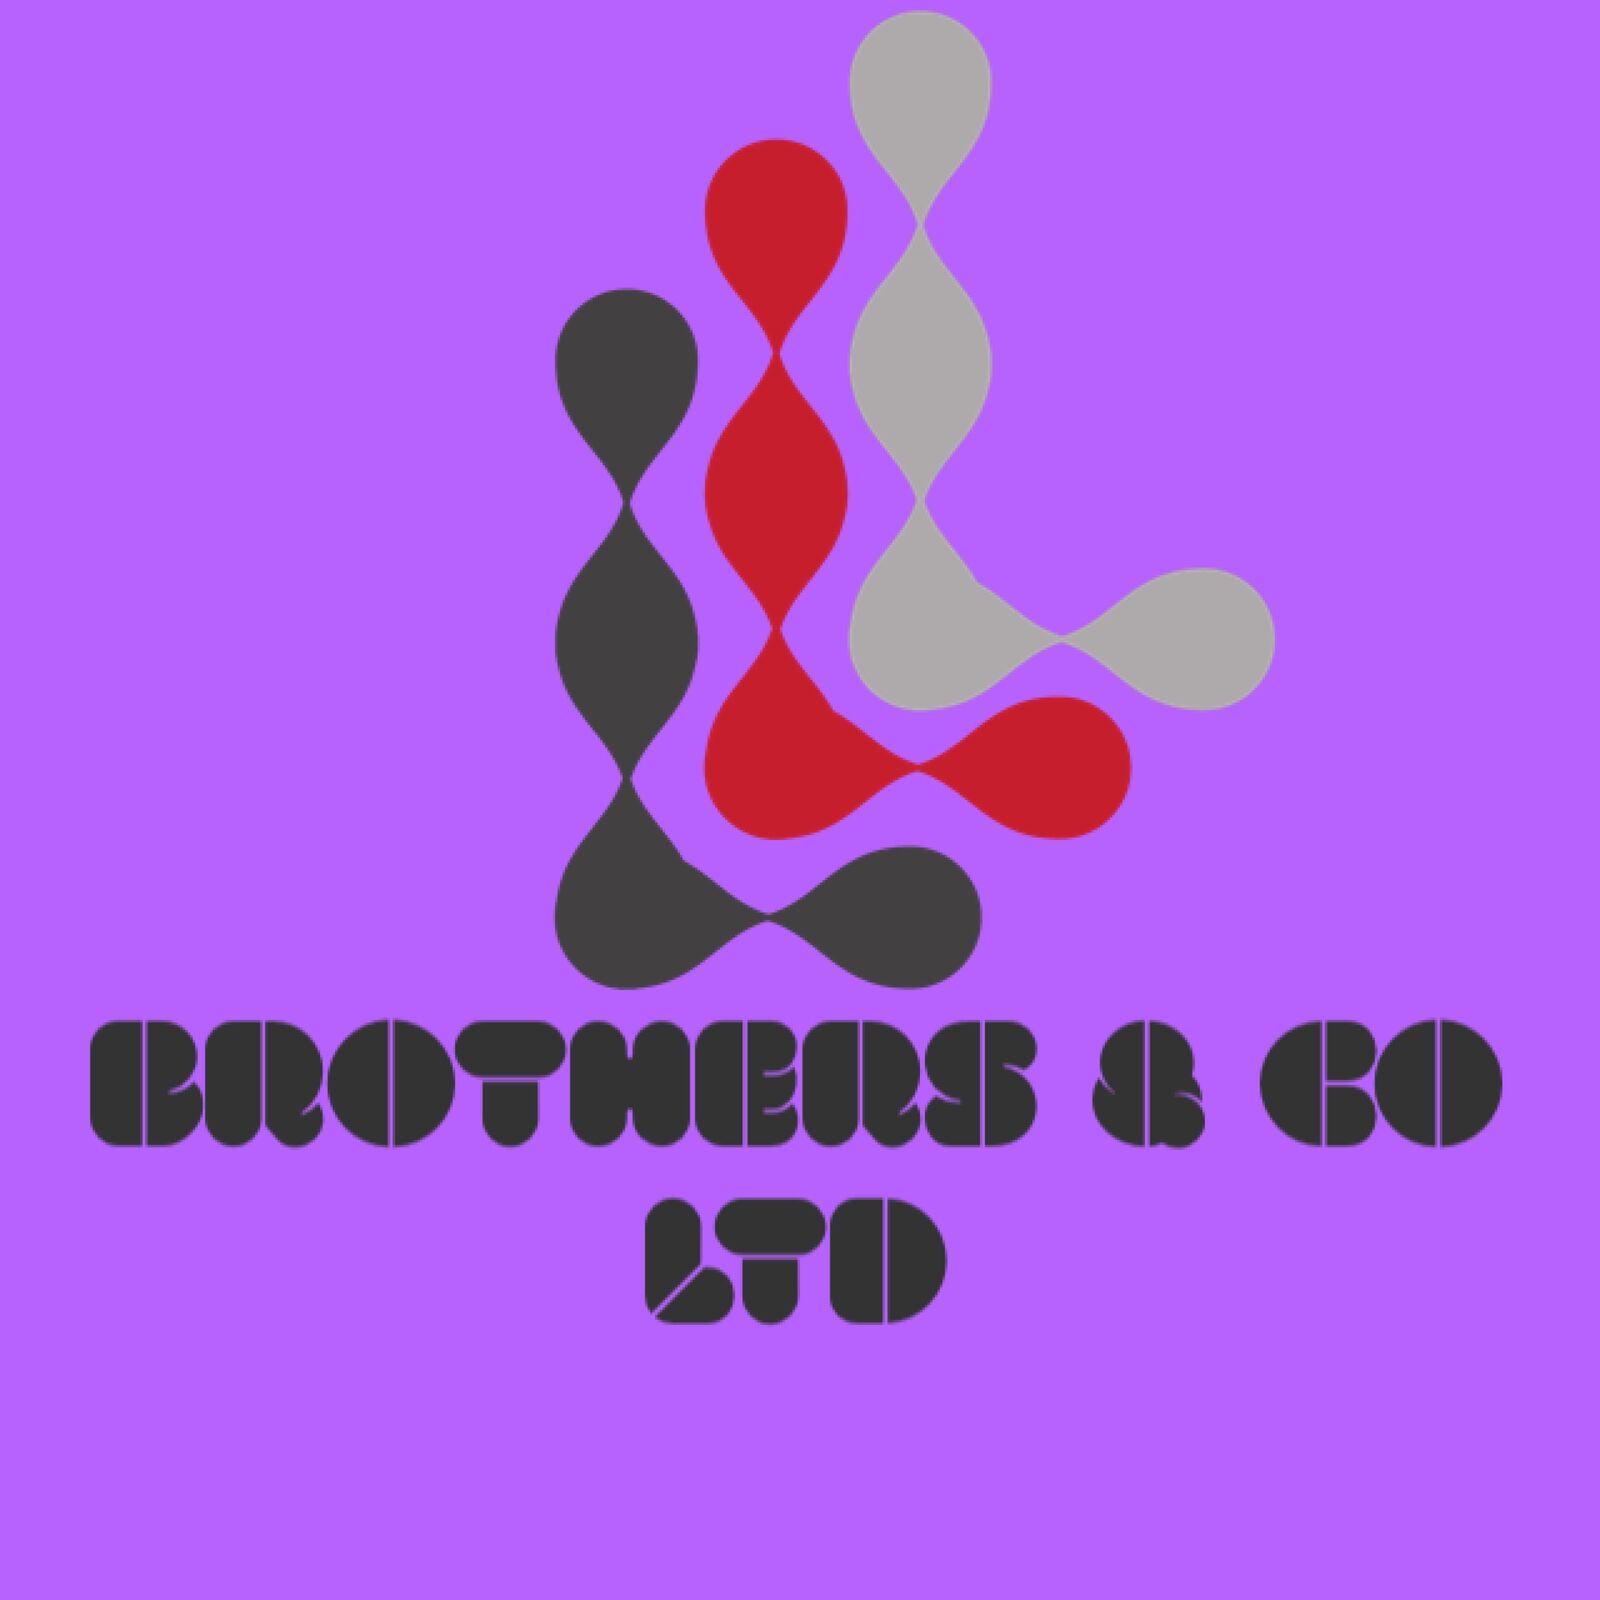 Brothers & Co Ltd.